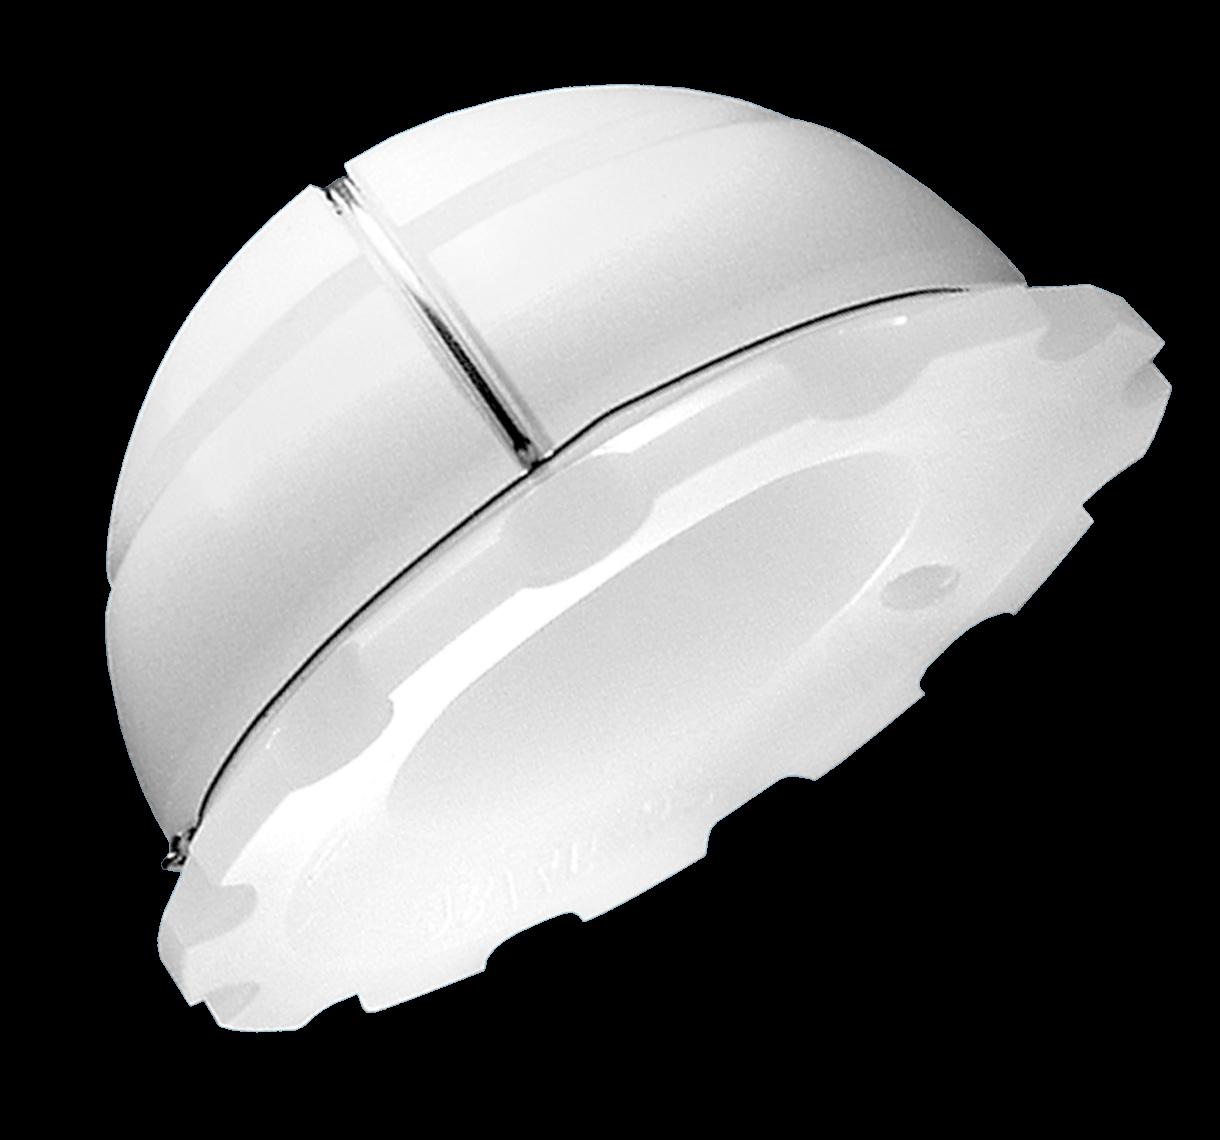 INITIALE® Acetabular cup